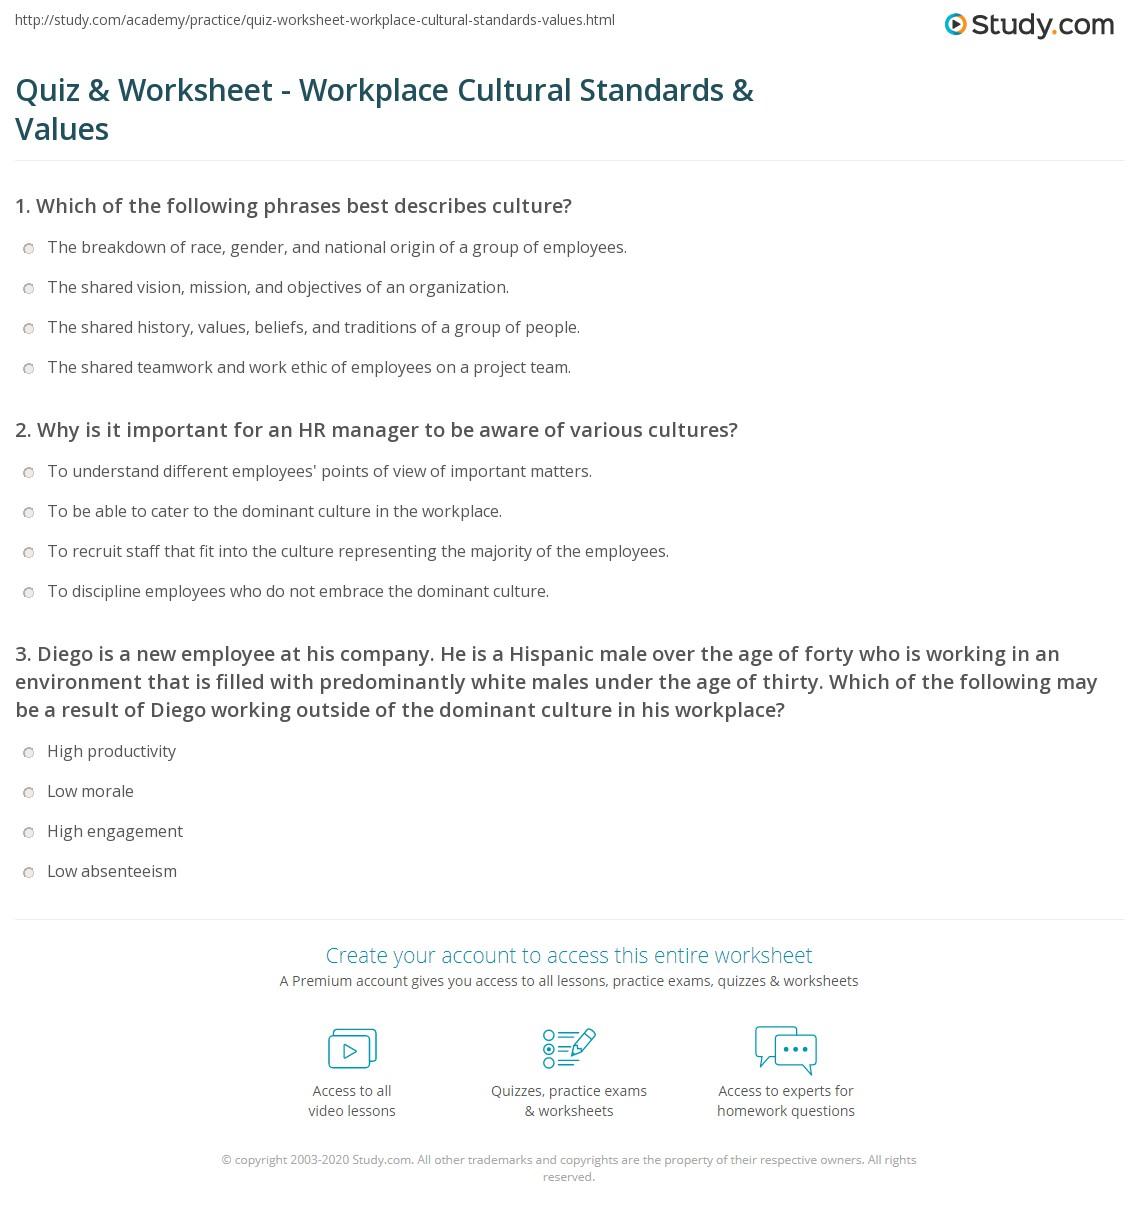 quiz worksheet workplace cultural standards values com print cultural standards values in the workplace knowledge application worksheet